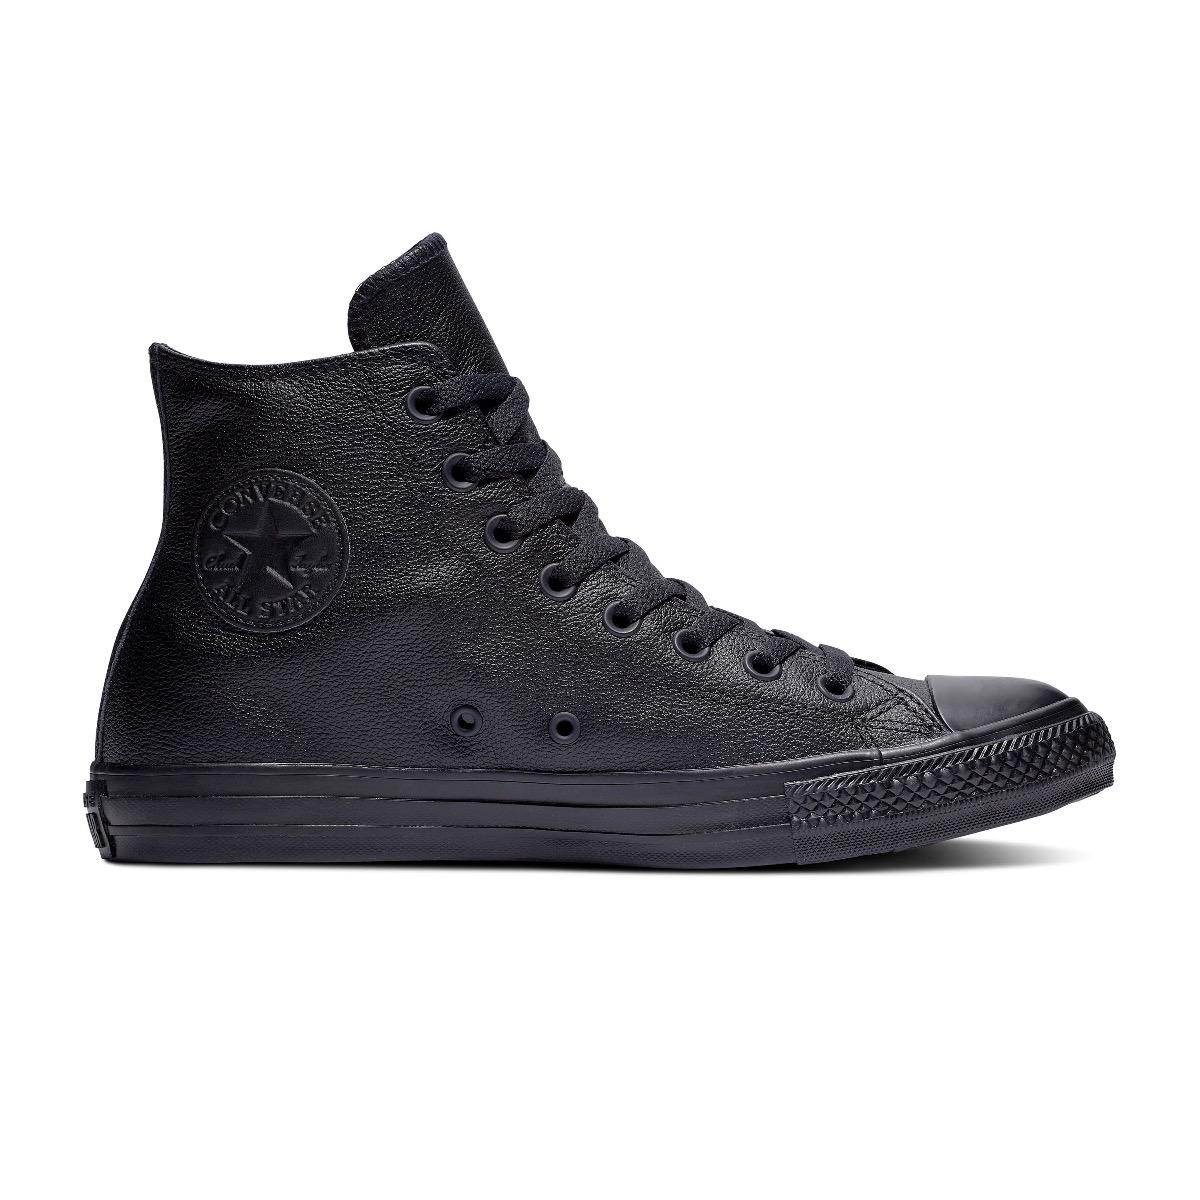 Converse All Stars Leather Hoog 135251C Zwart-35 maat 35